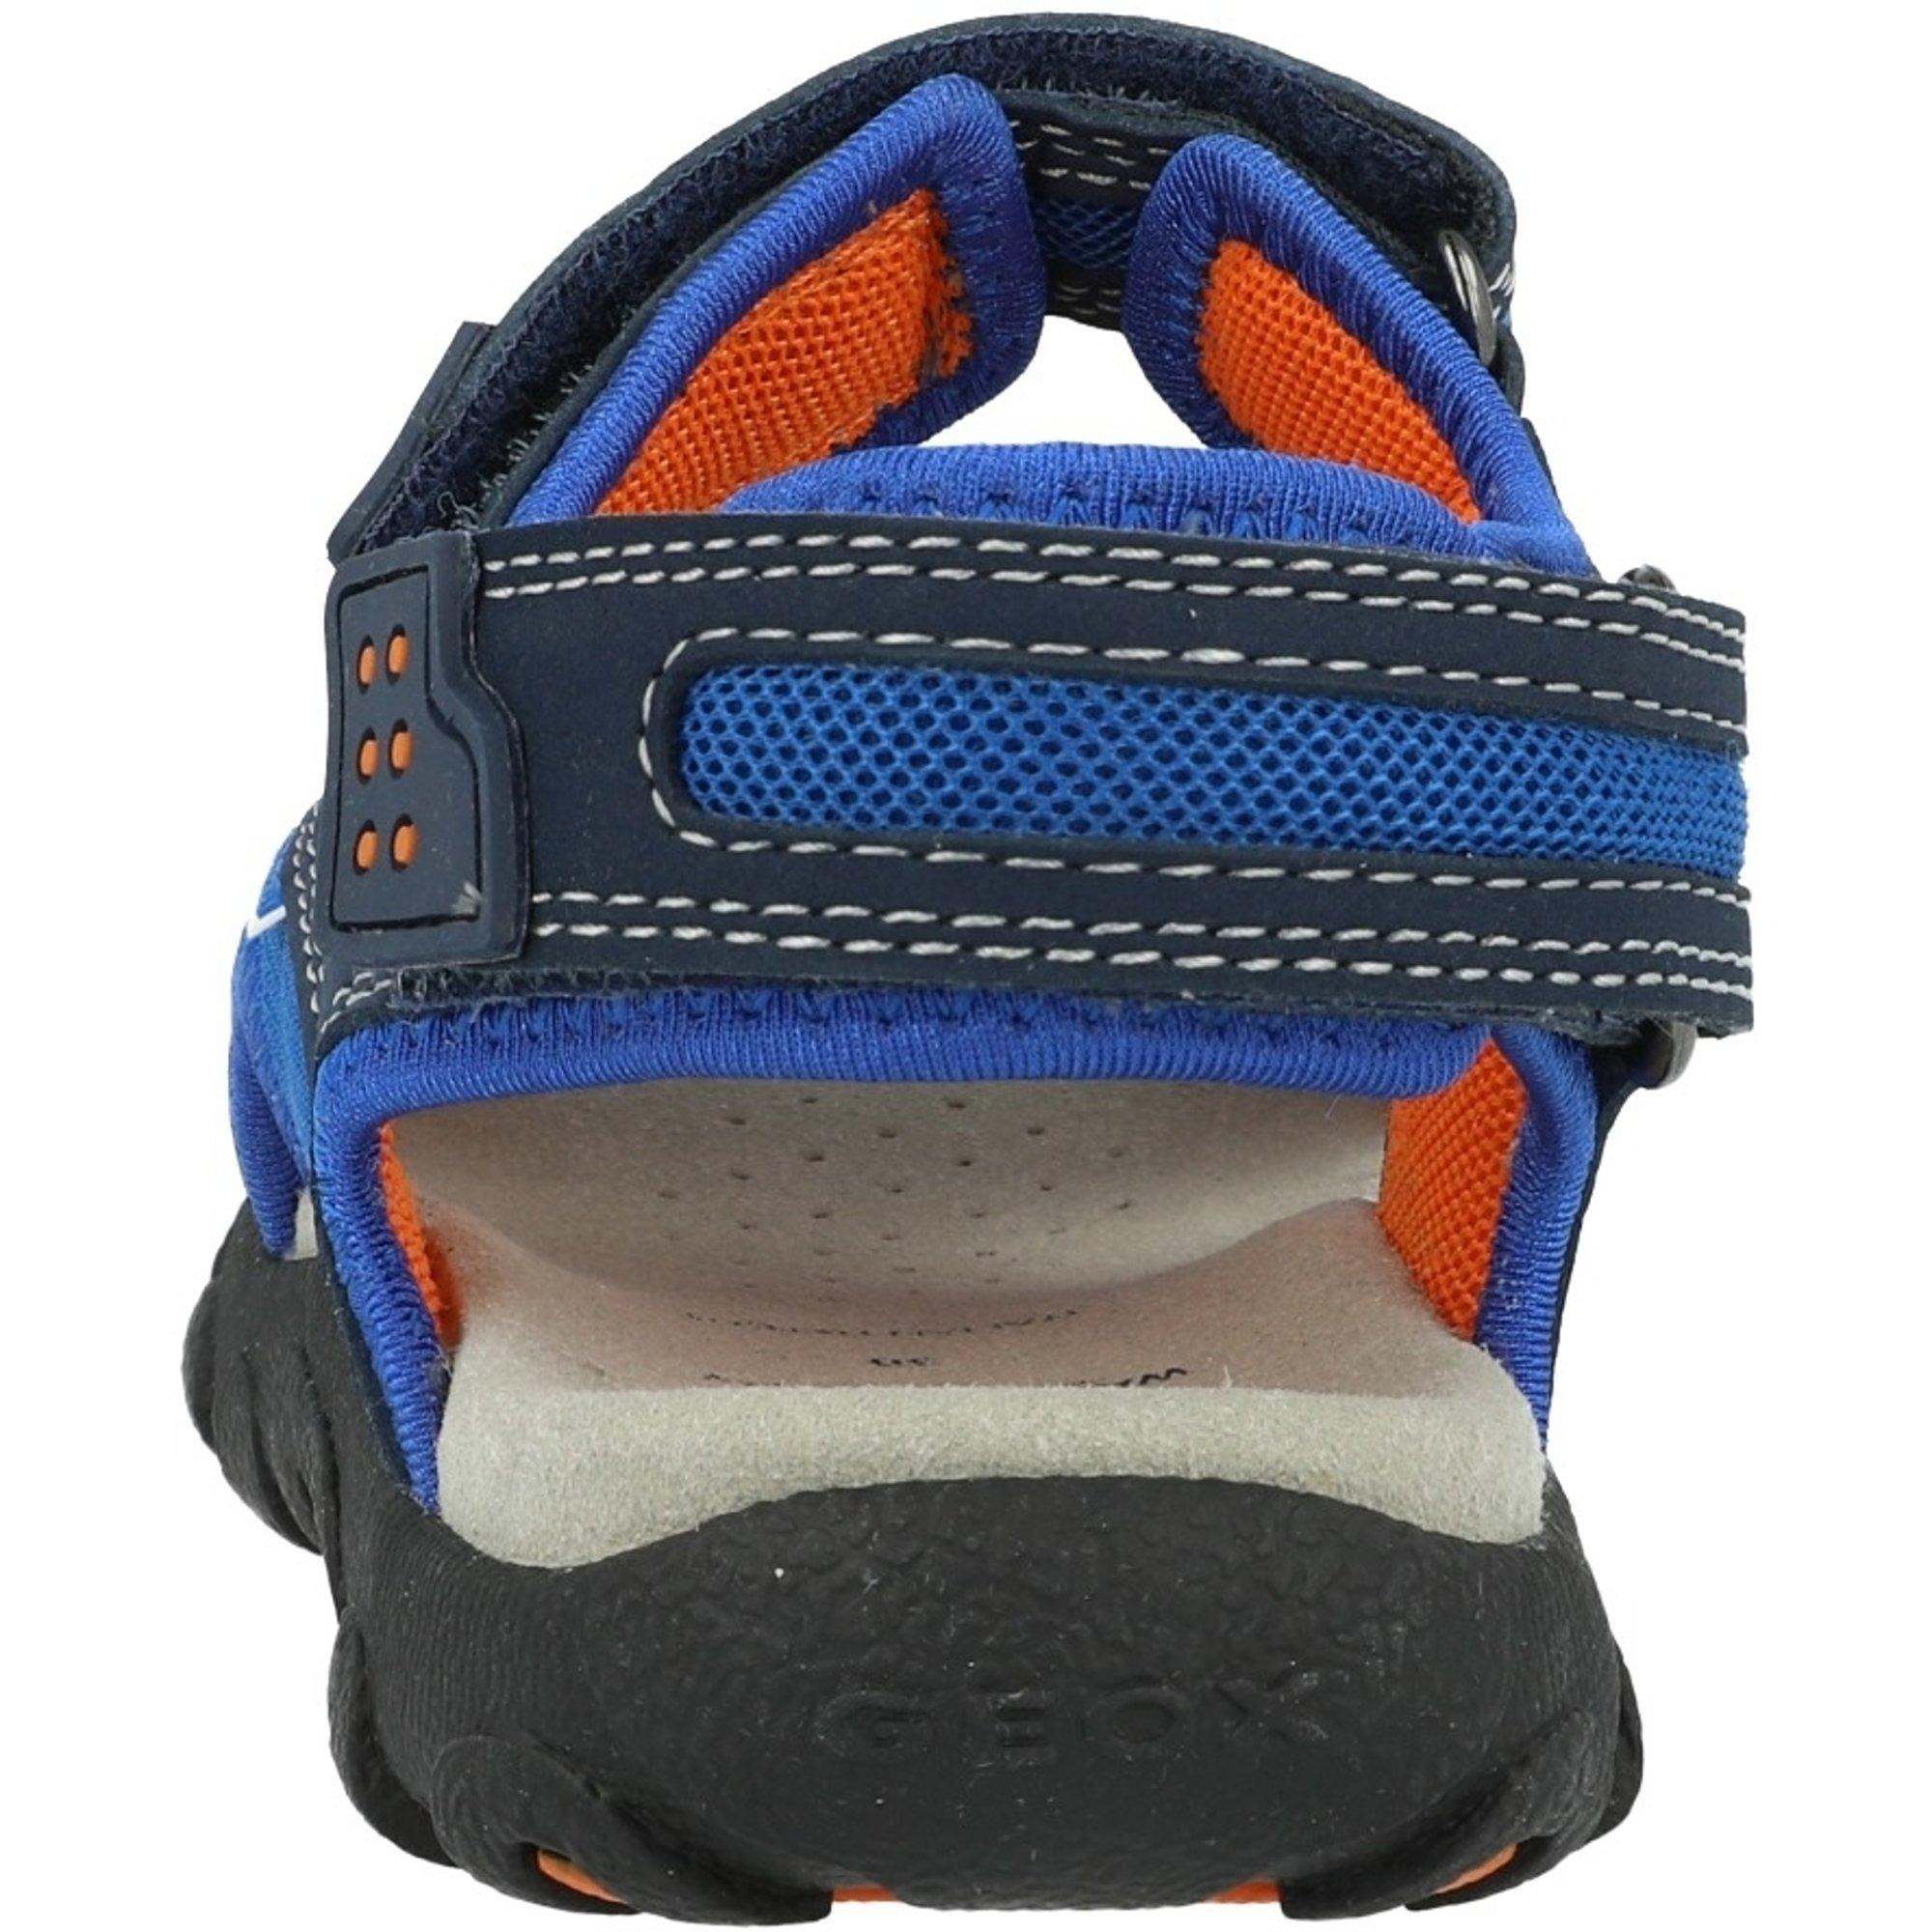 Manto Autenticación infinito  Geox J Strada B Azul/Naranja (Navy/Orange) Malla - Correa Sandalias -  Awesome Shoes